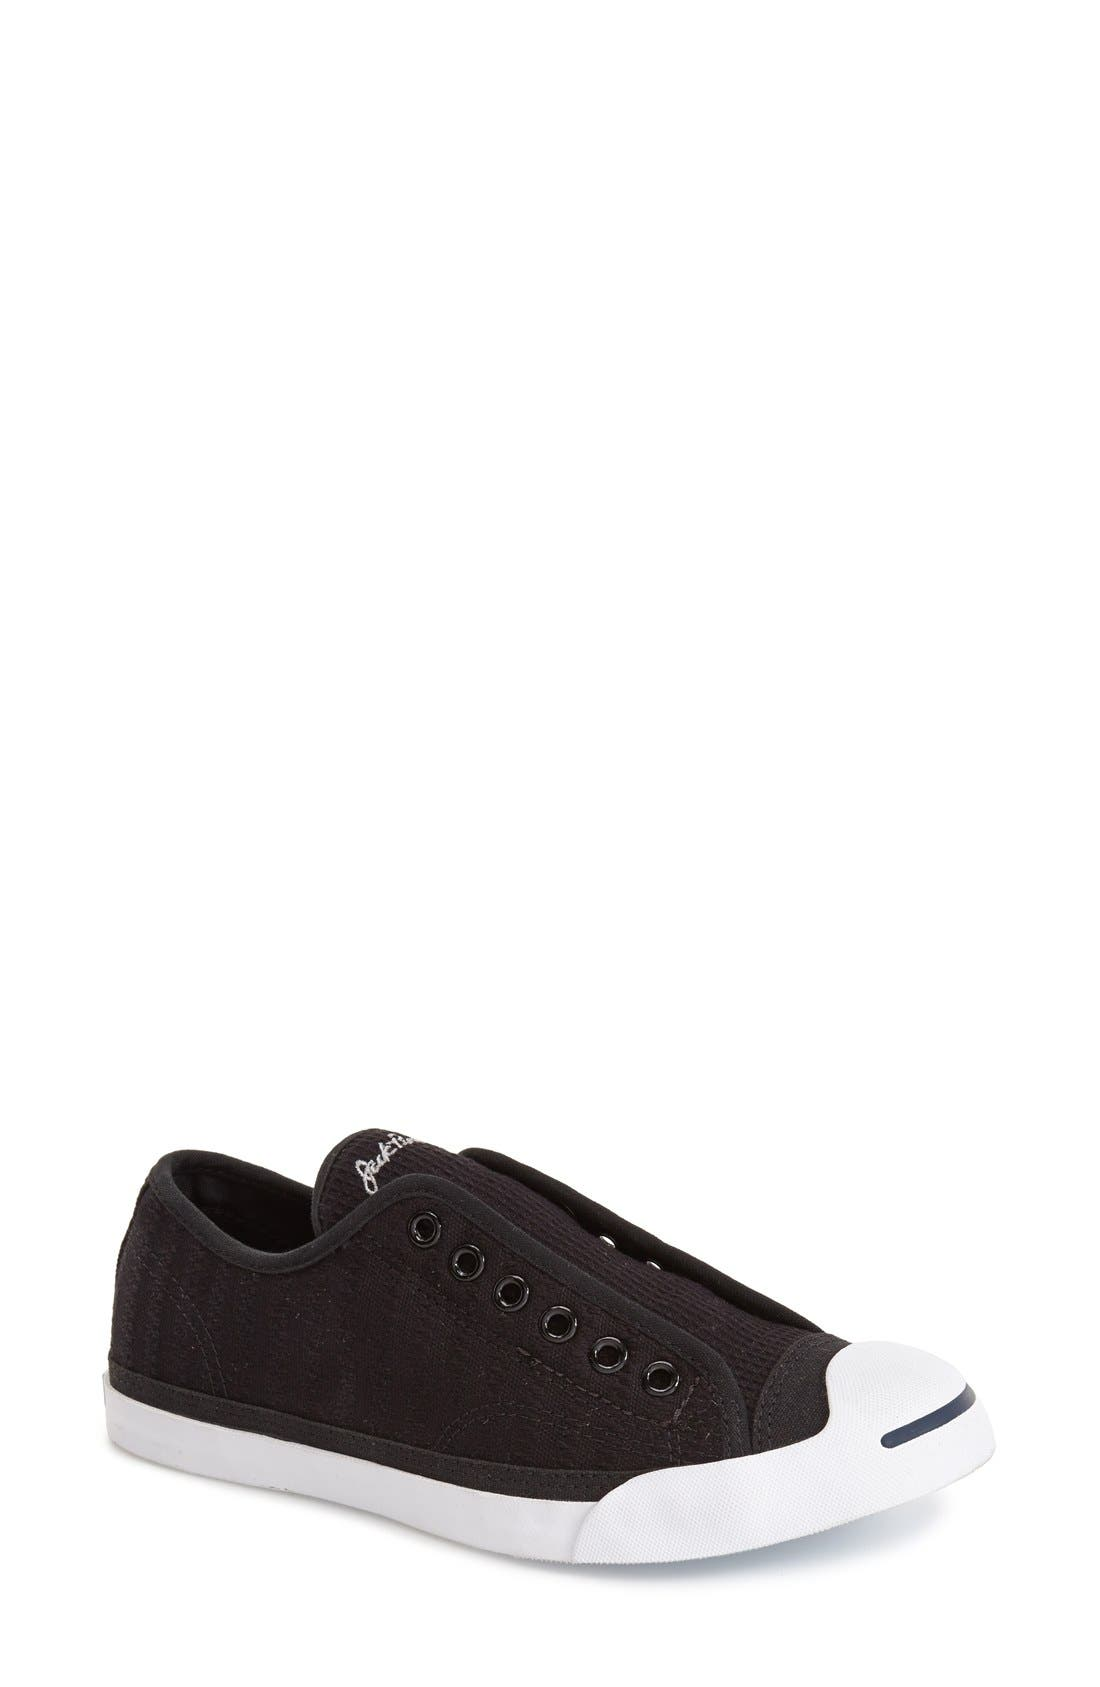 'Jack Purcell' Garment Dye Low Top Sneaker,                         Main,                         color,